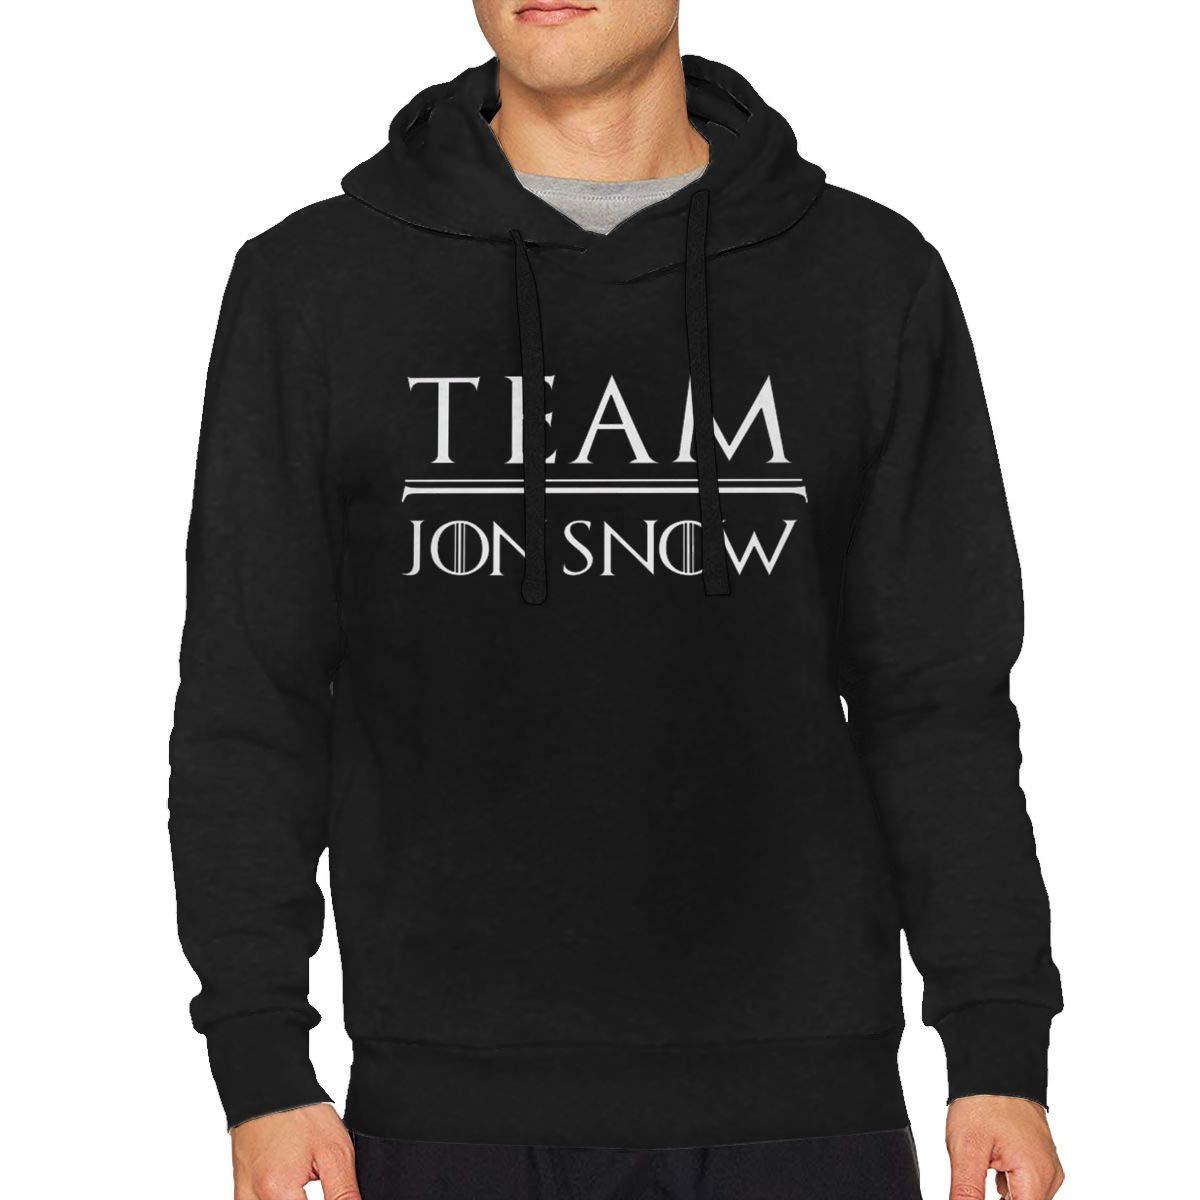 Apfdkqdgadc Man S Team Jon Snow R Ncasual R N 8675 Shirts